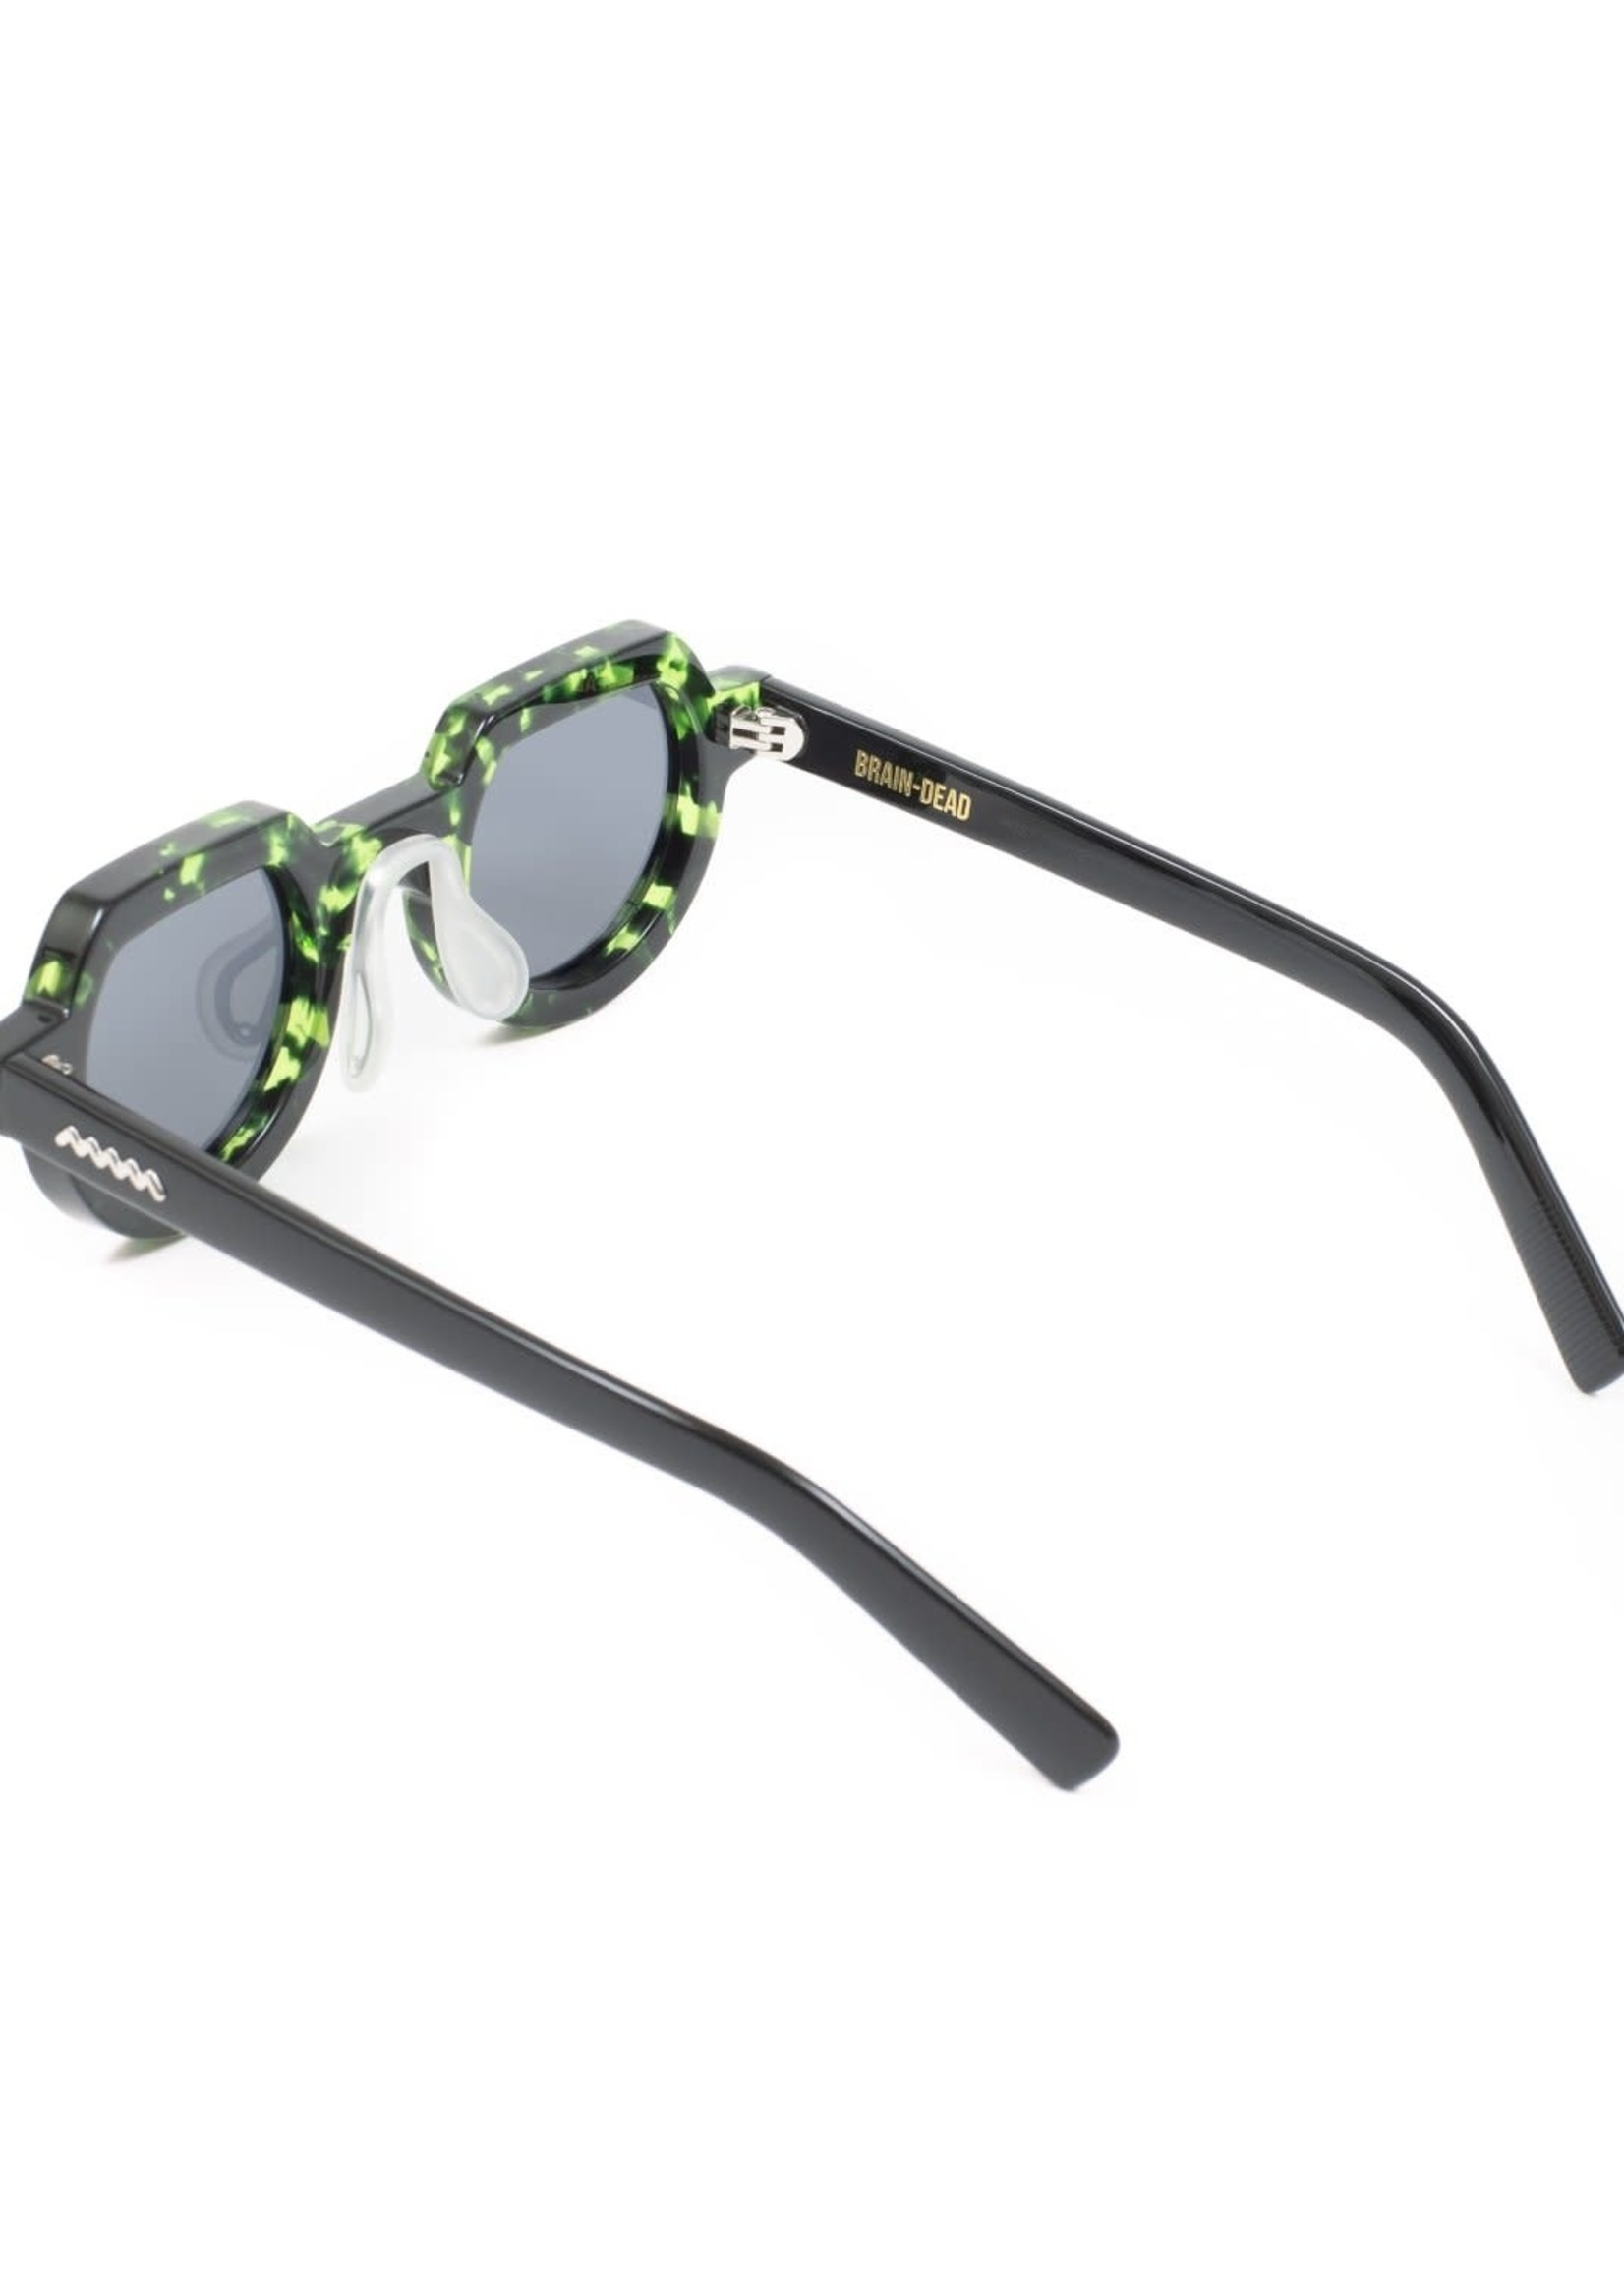 Brain Dead Tani Sunglasses in Green Tortoise / Black